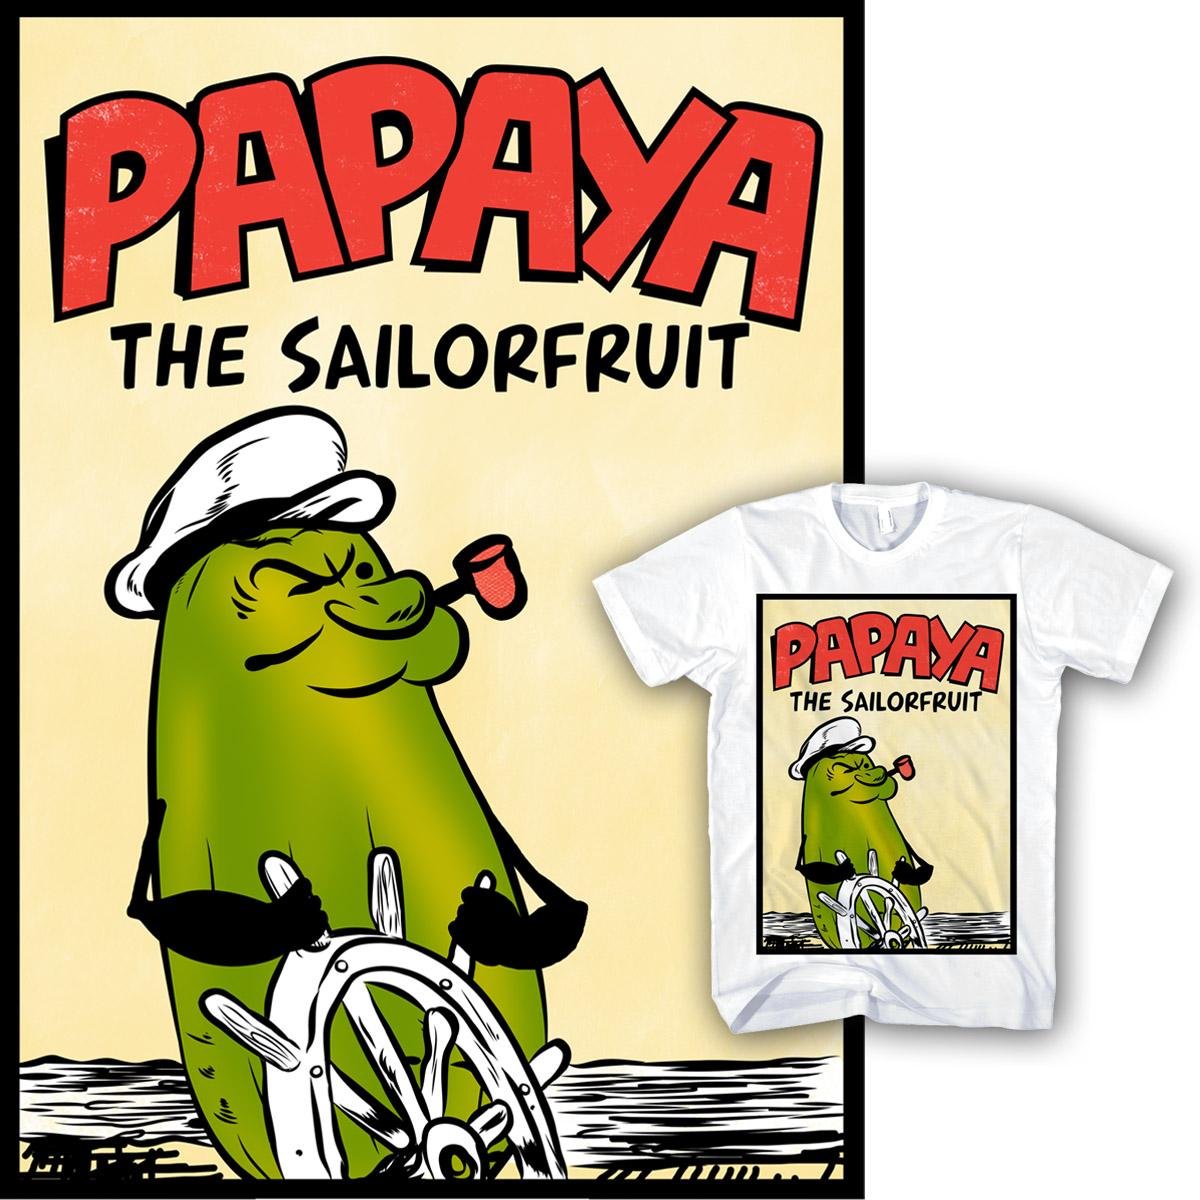 Papaya The Sailorfruit by mainial on Threadless